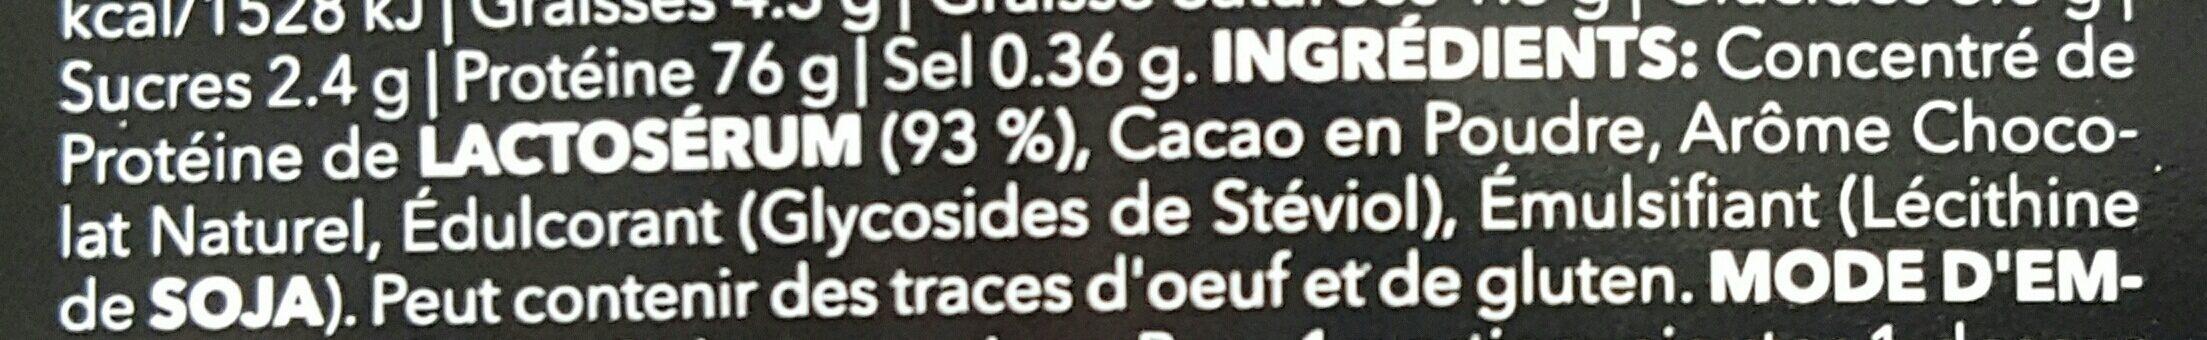 100% Real Whey Protein Stevia Dark Chocolate - Ingrediënten - fr